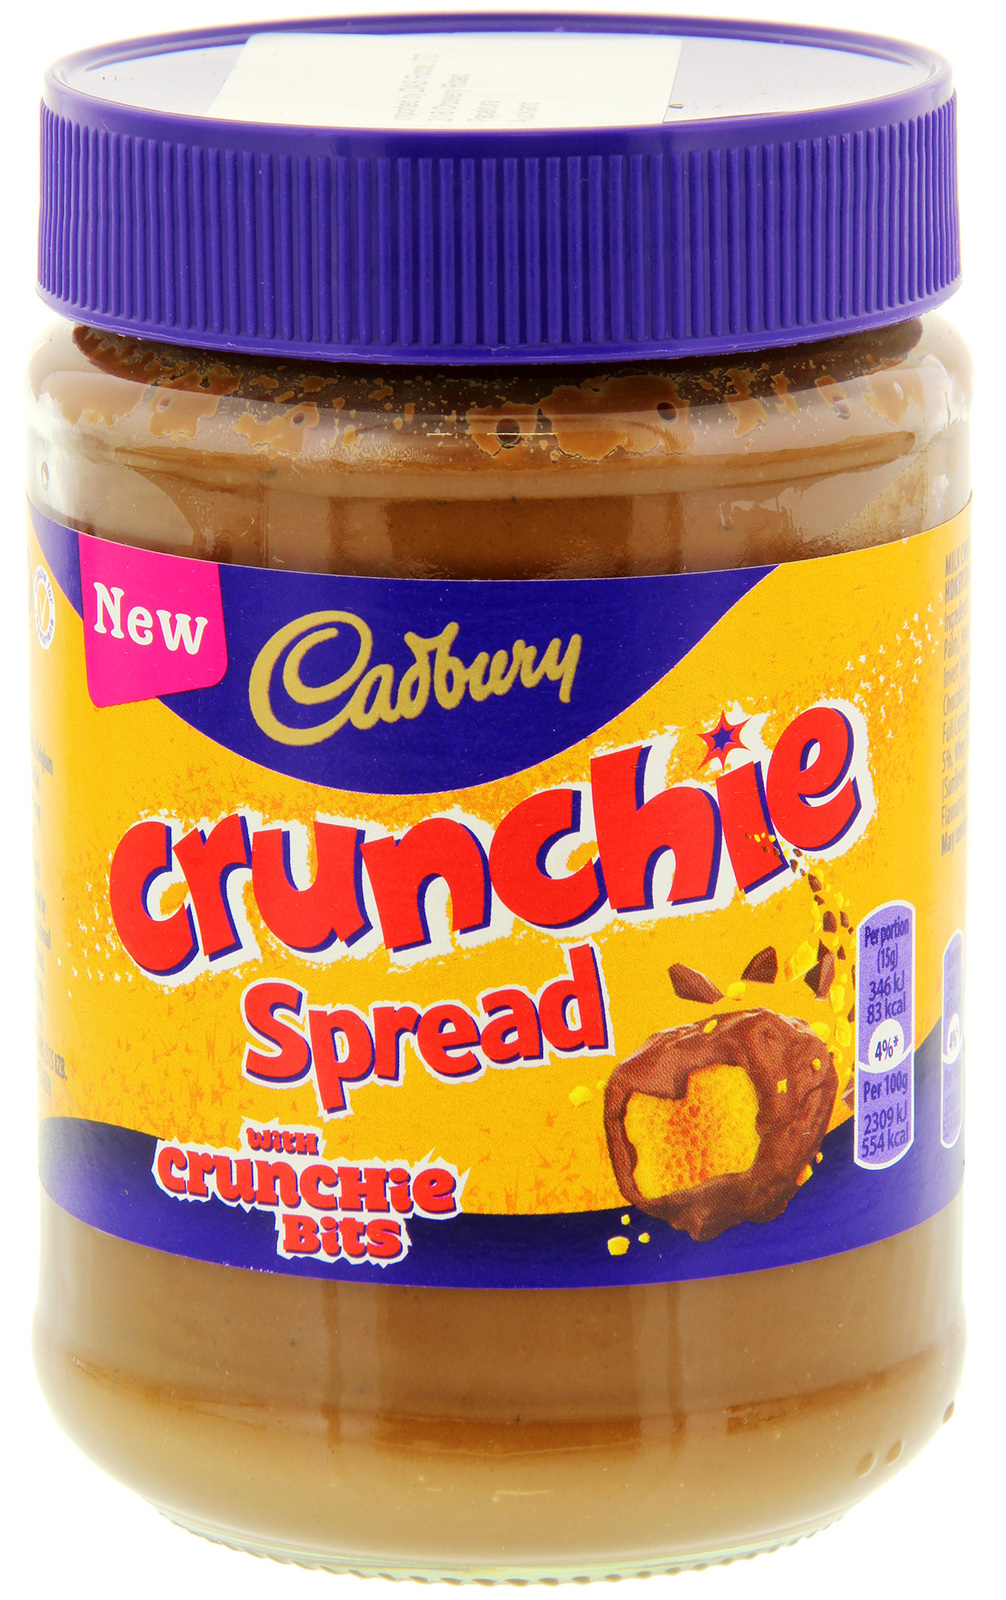 Cadbury Crunchie Spread (400g) image